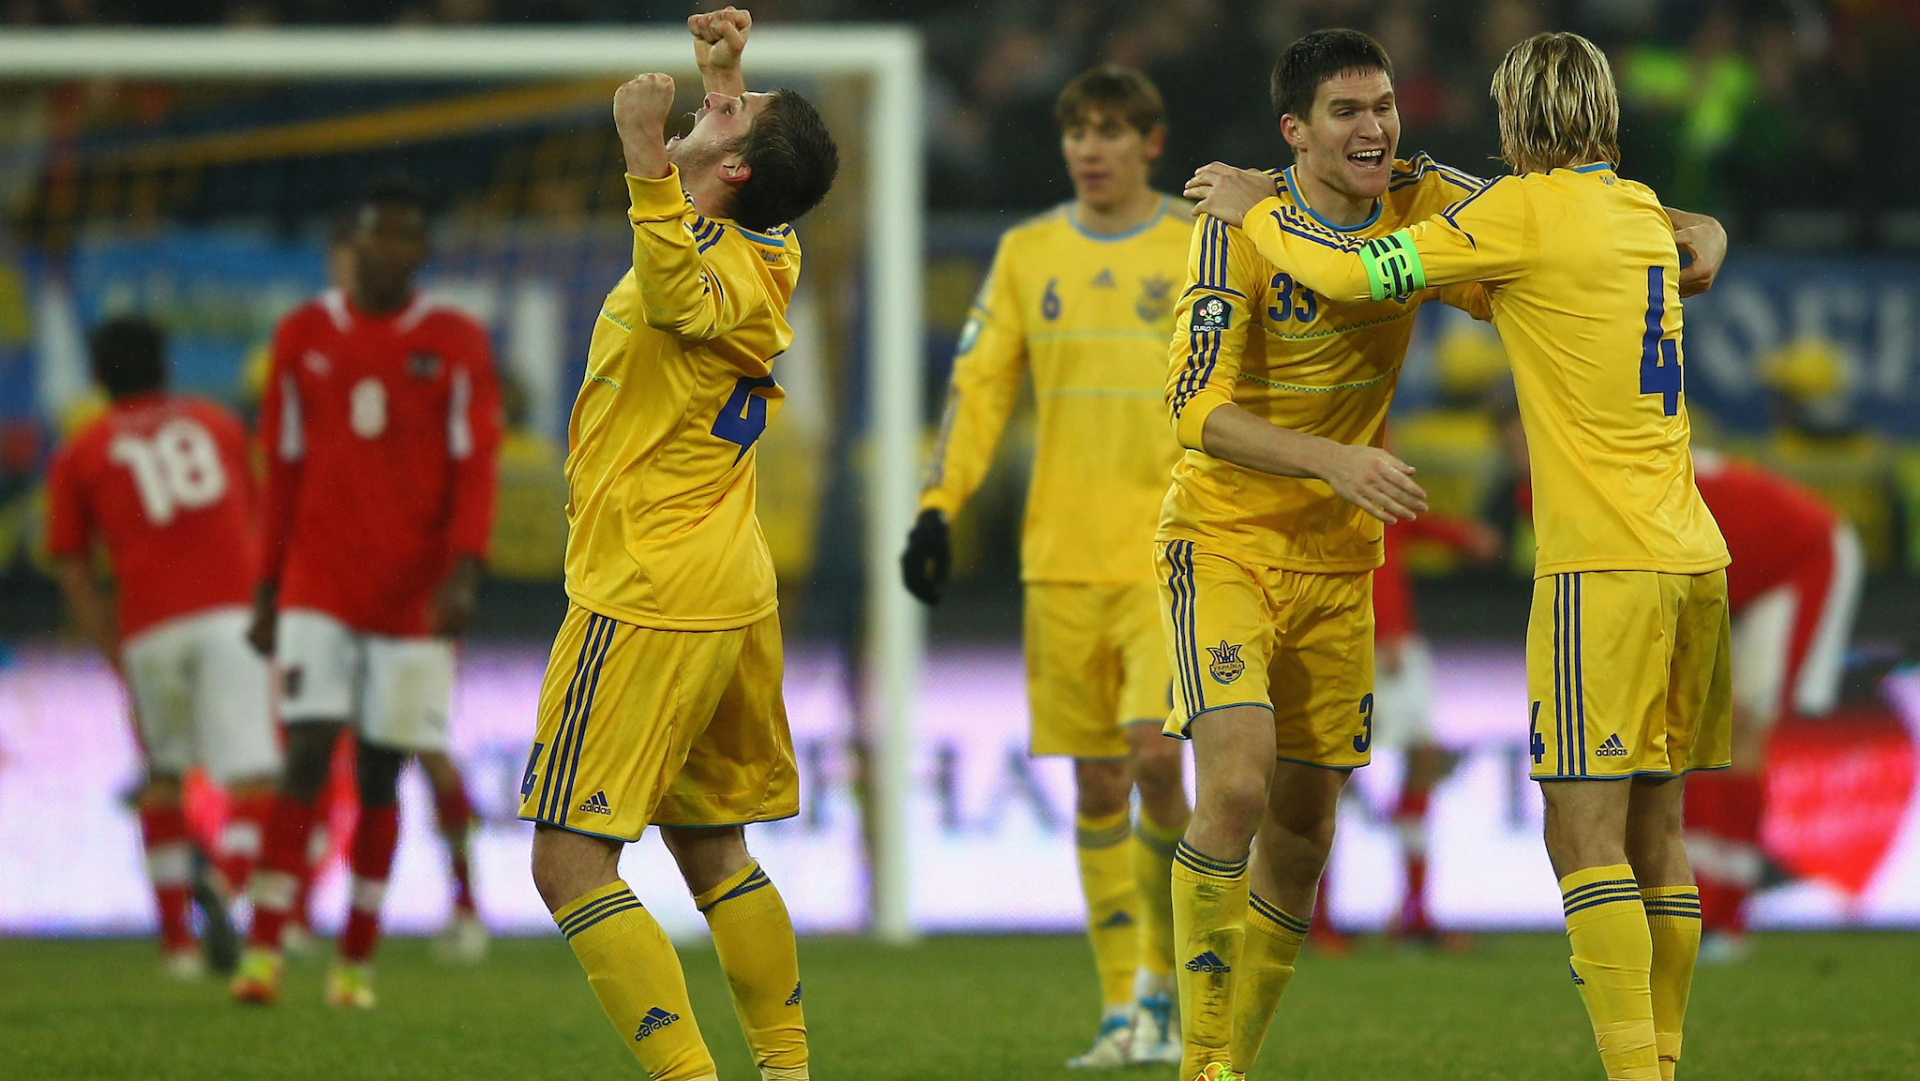 Ukraine vs Austria: Fixtures, match schedule, TV channels and live stream